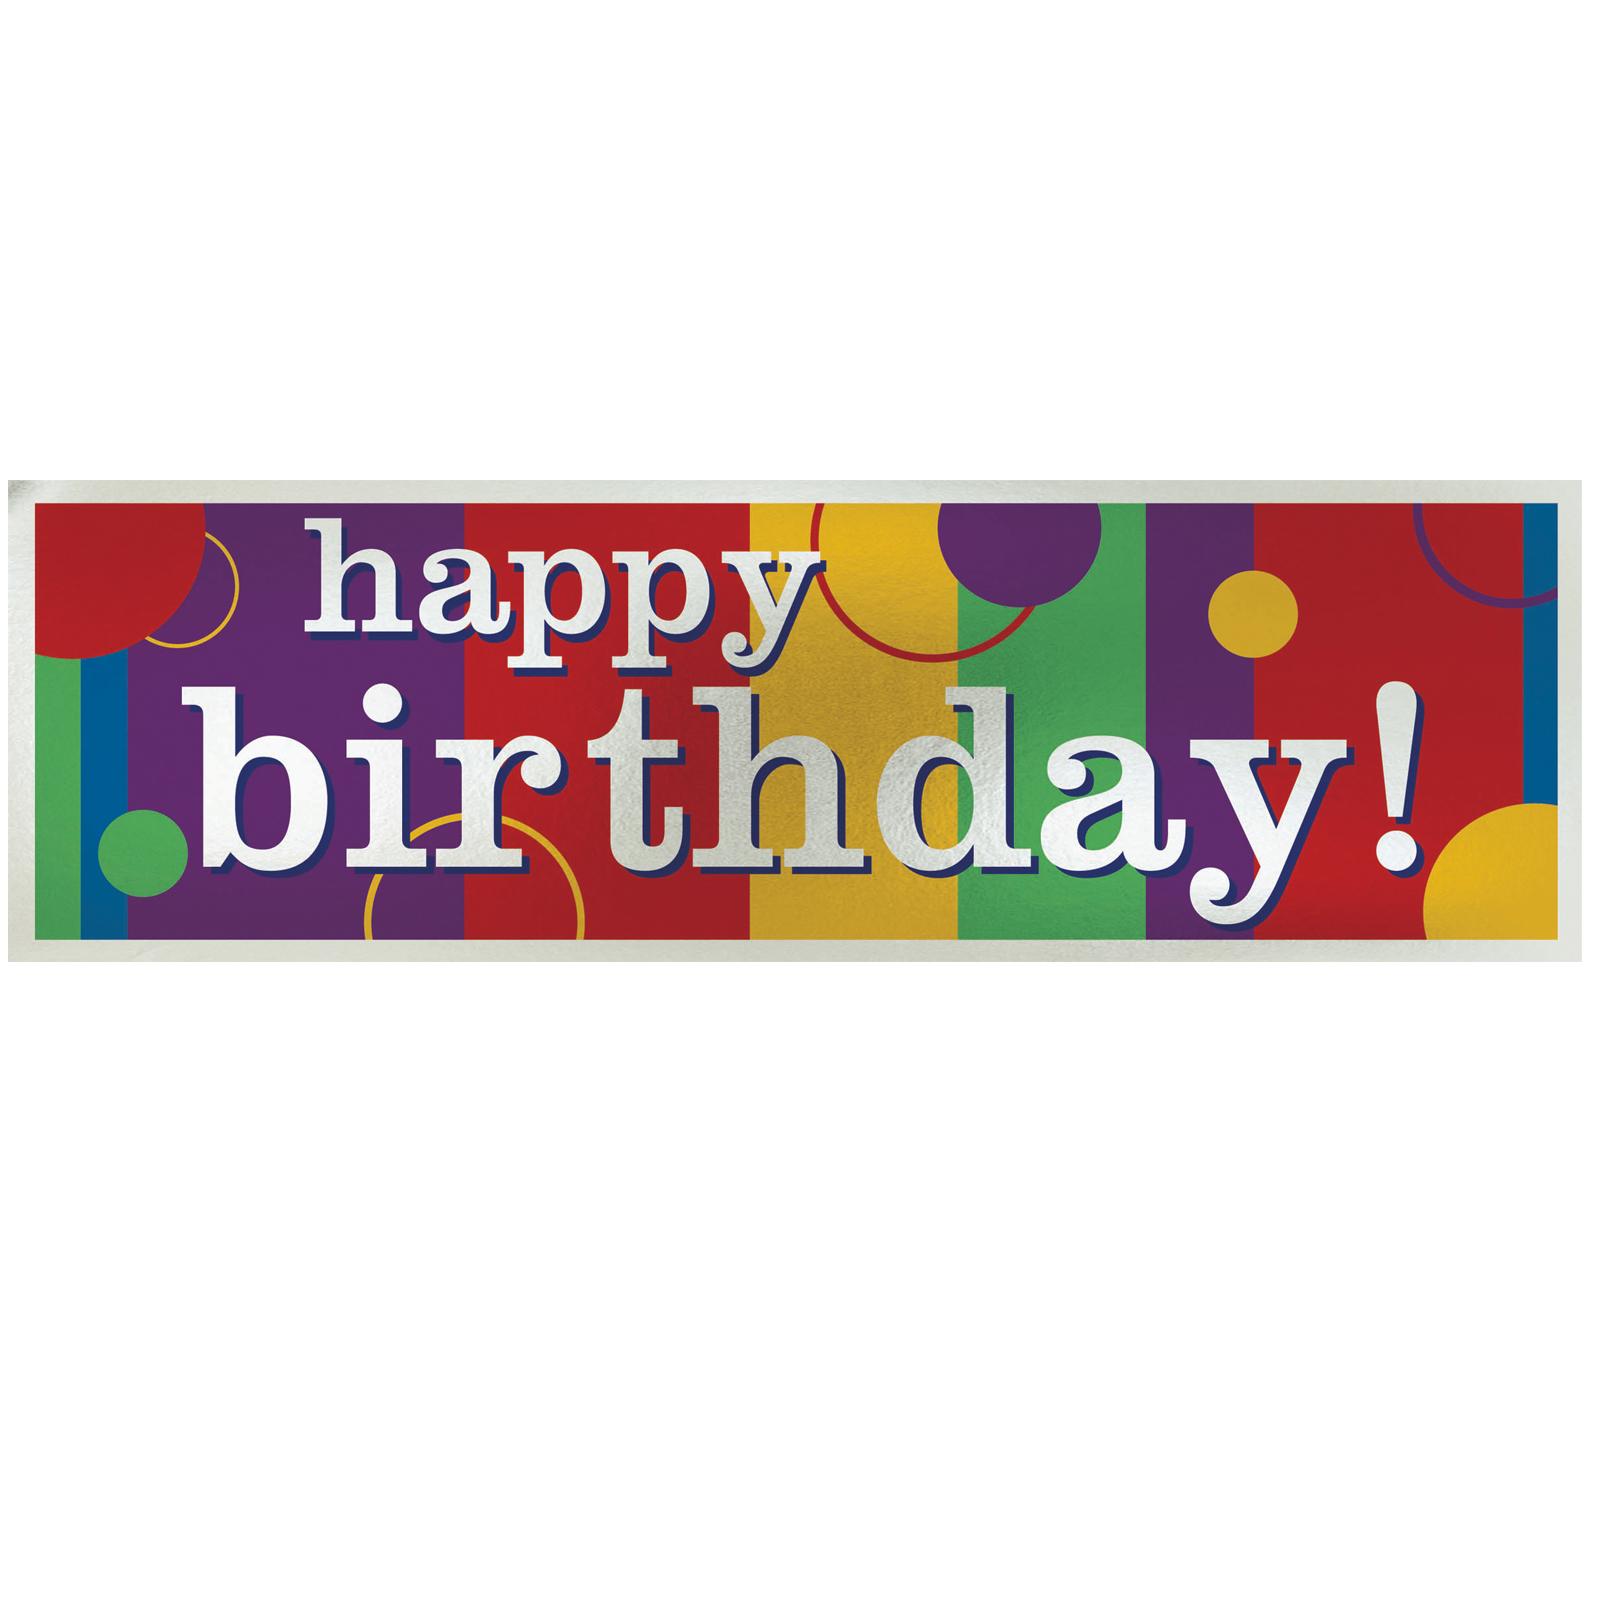 Barney Birthday Cake Hd Wallpaper